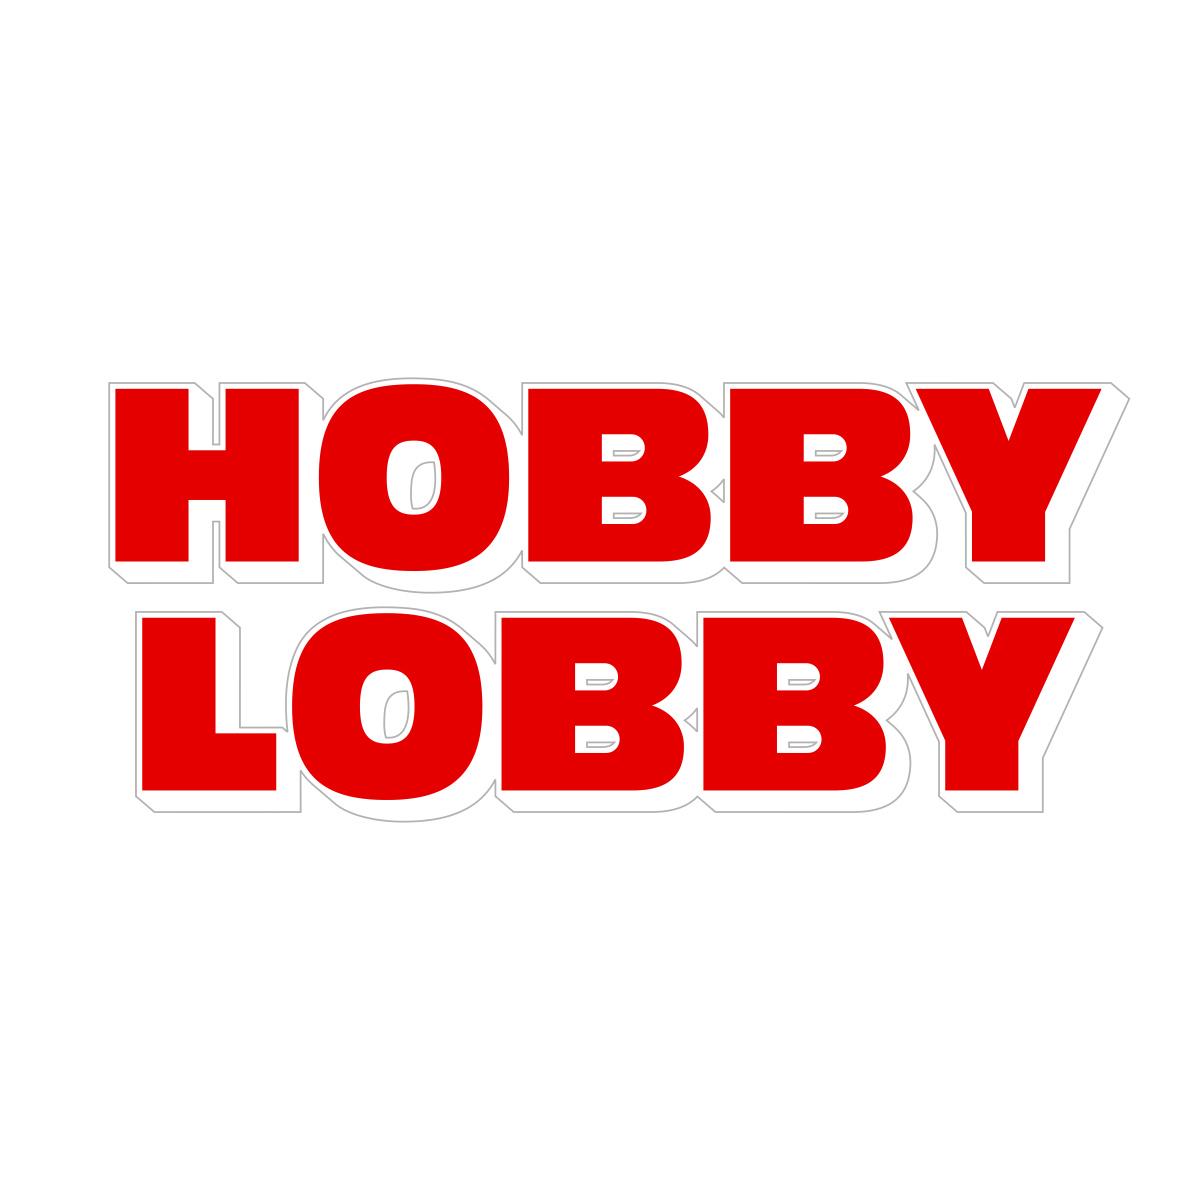 https://promotionplusinc.com/wp-content/uploads/2019/04/Hobby-Lobby.jpg